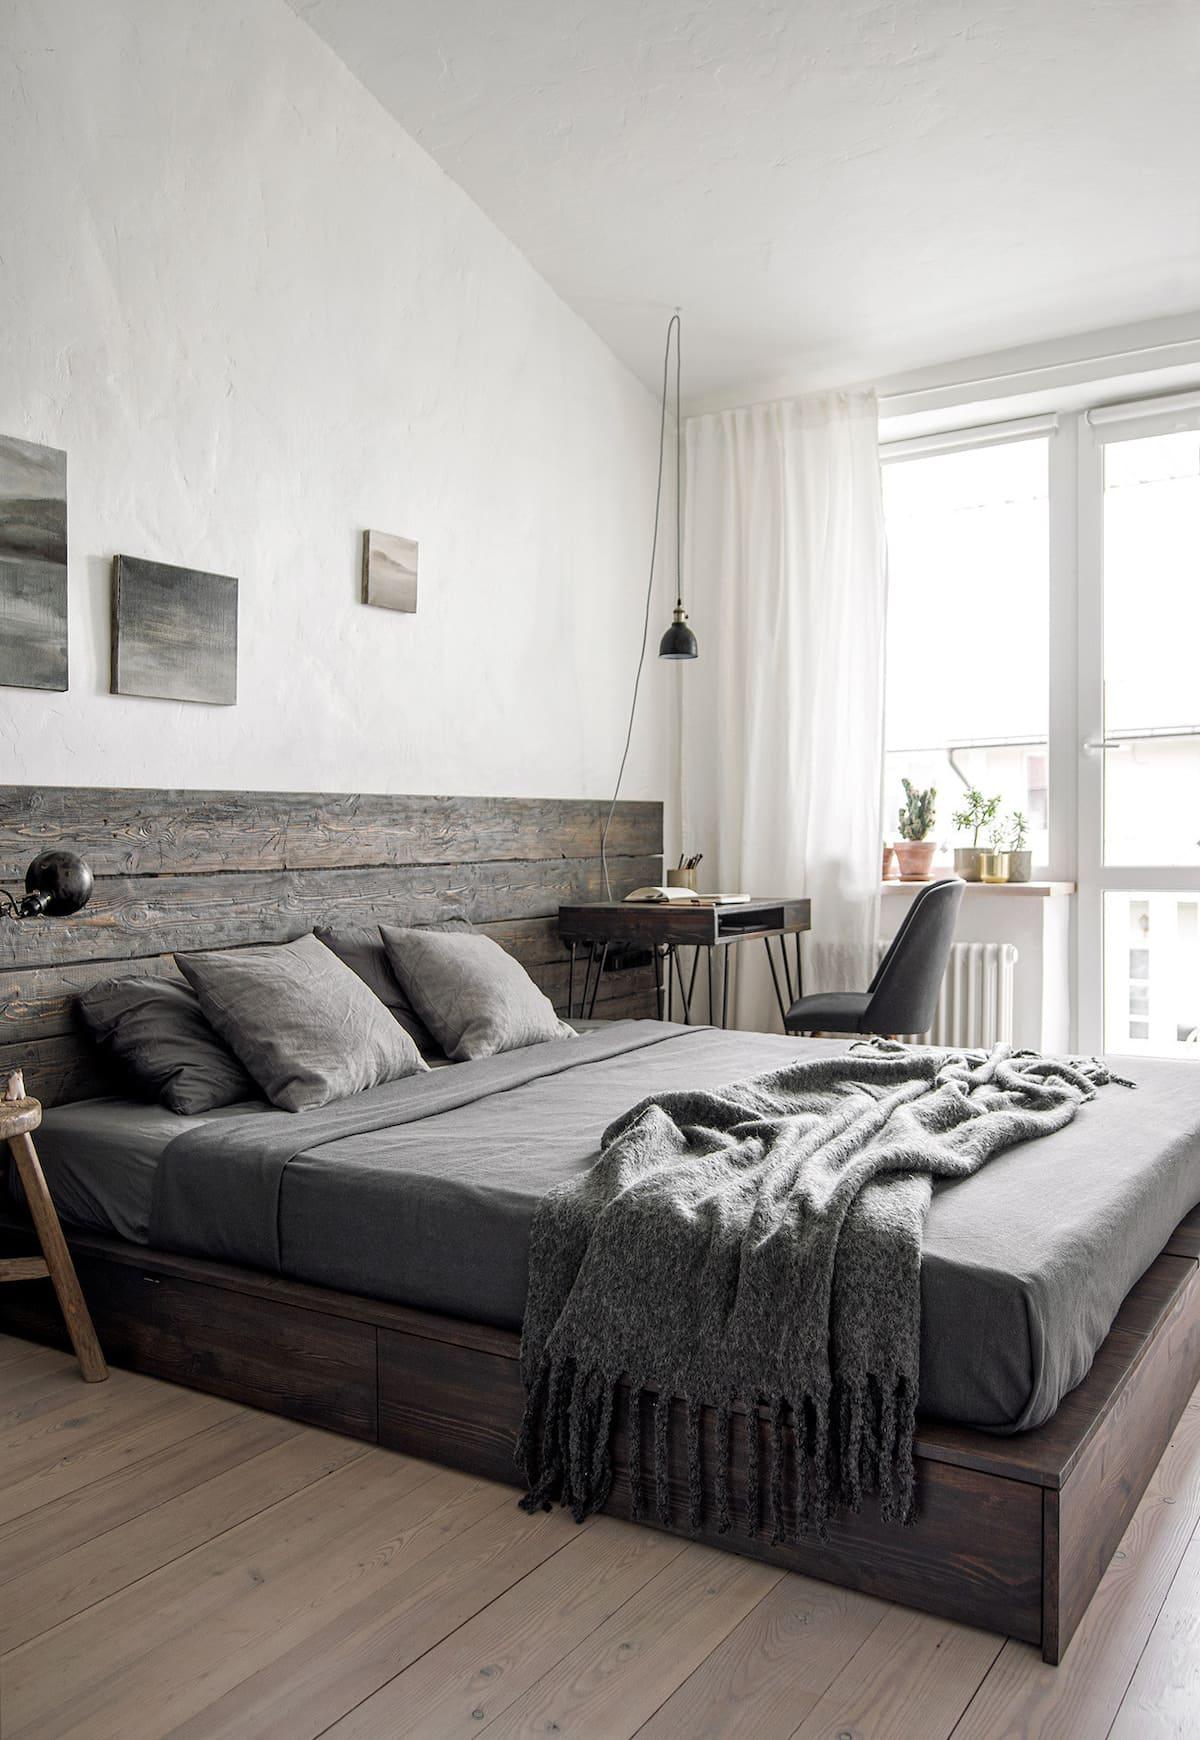 интерьер спальни фото 11